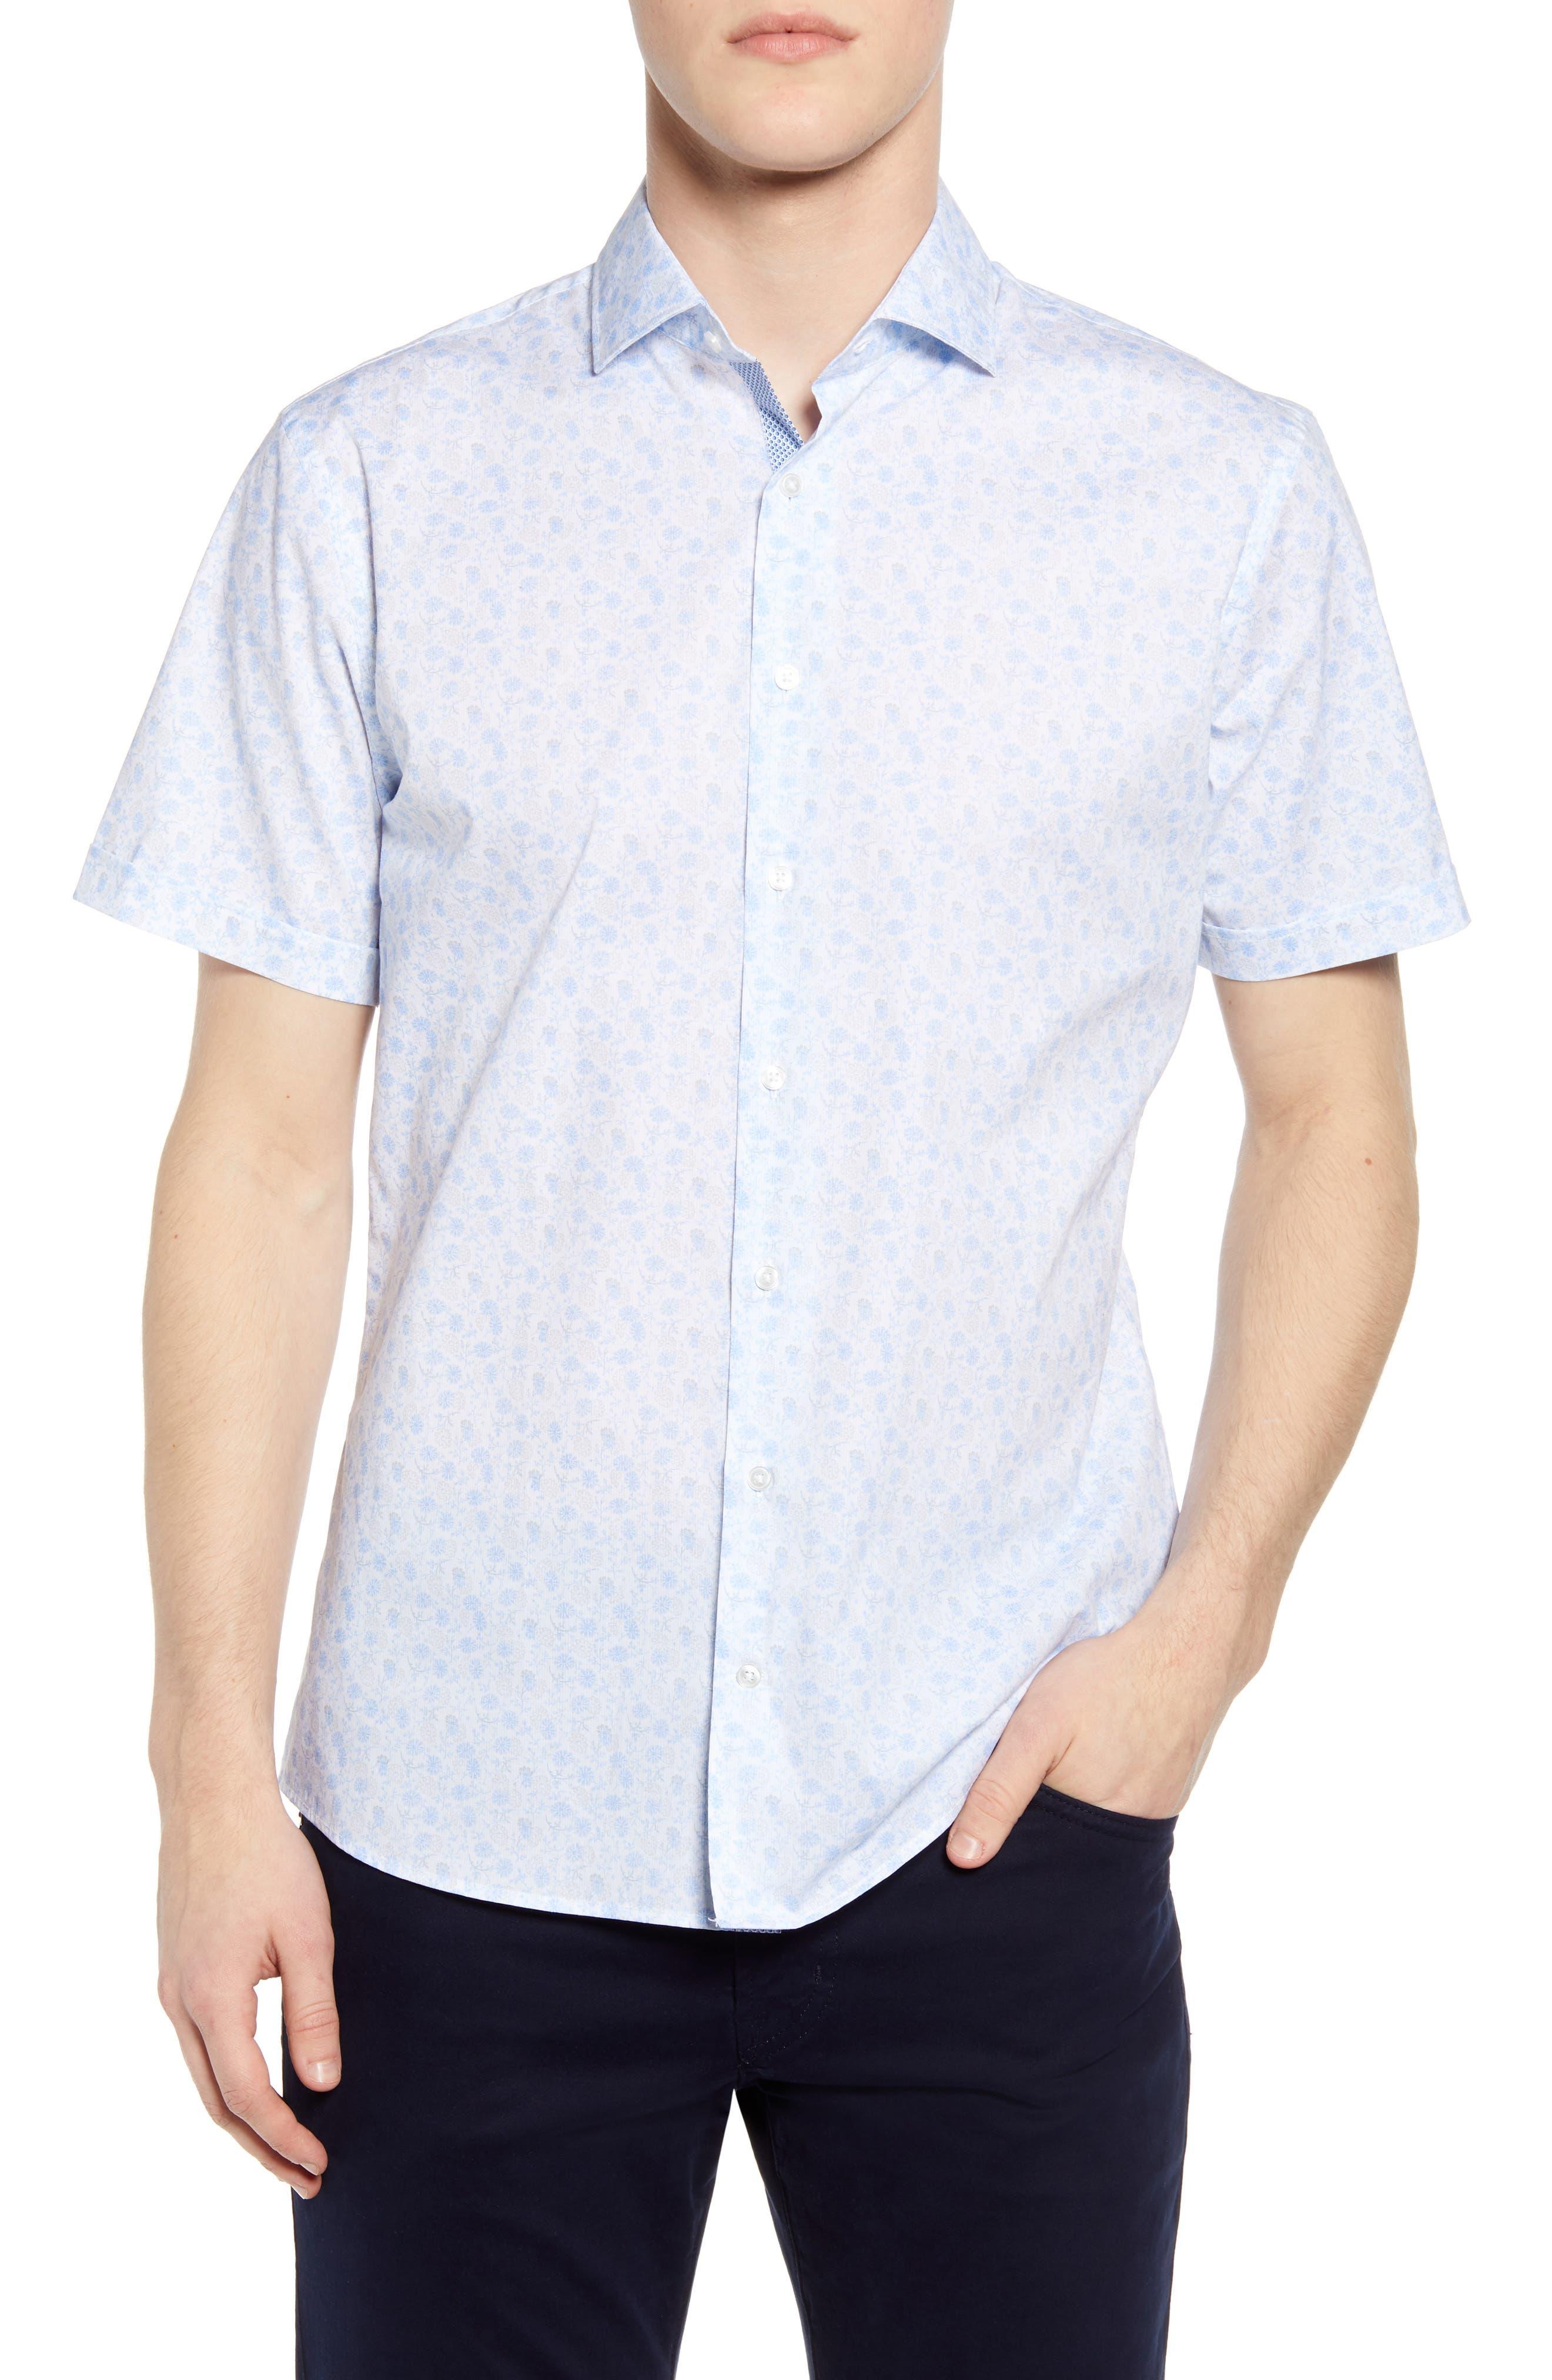 Kelly Hi-Flex Modern Fit Floral Short Sleeve Button-Up Shirt